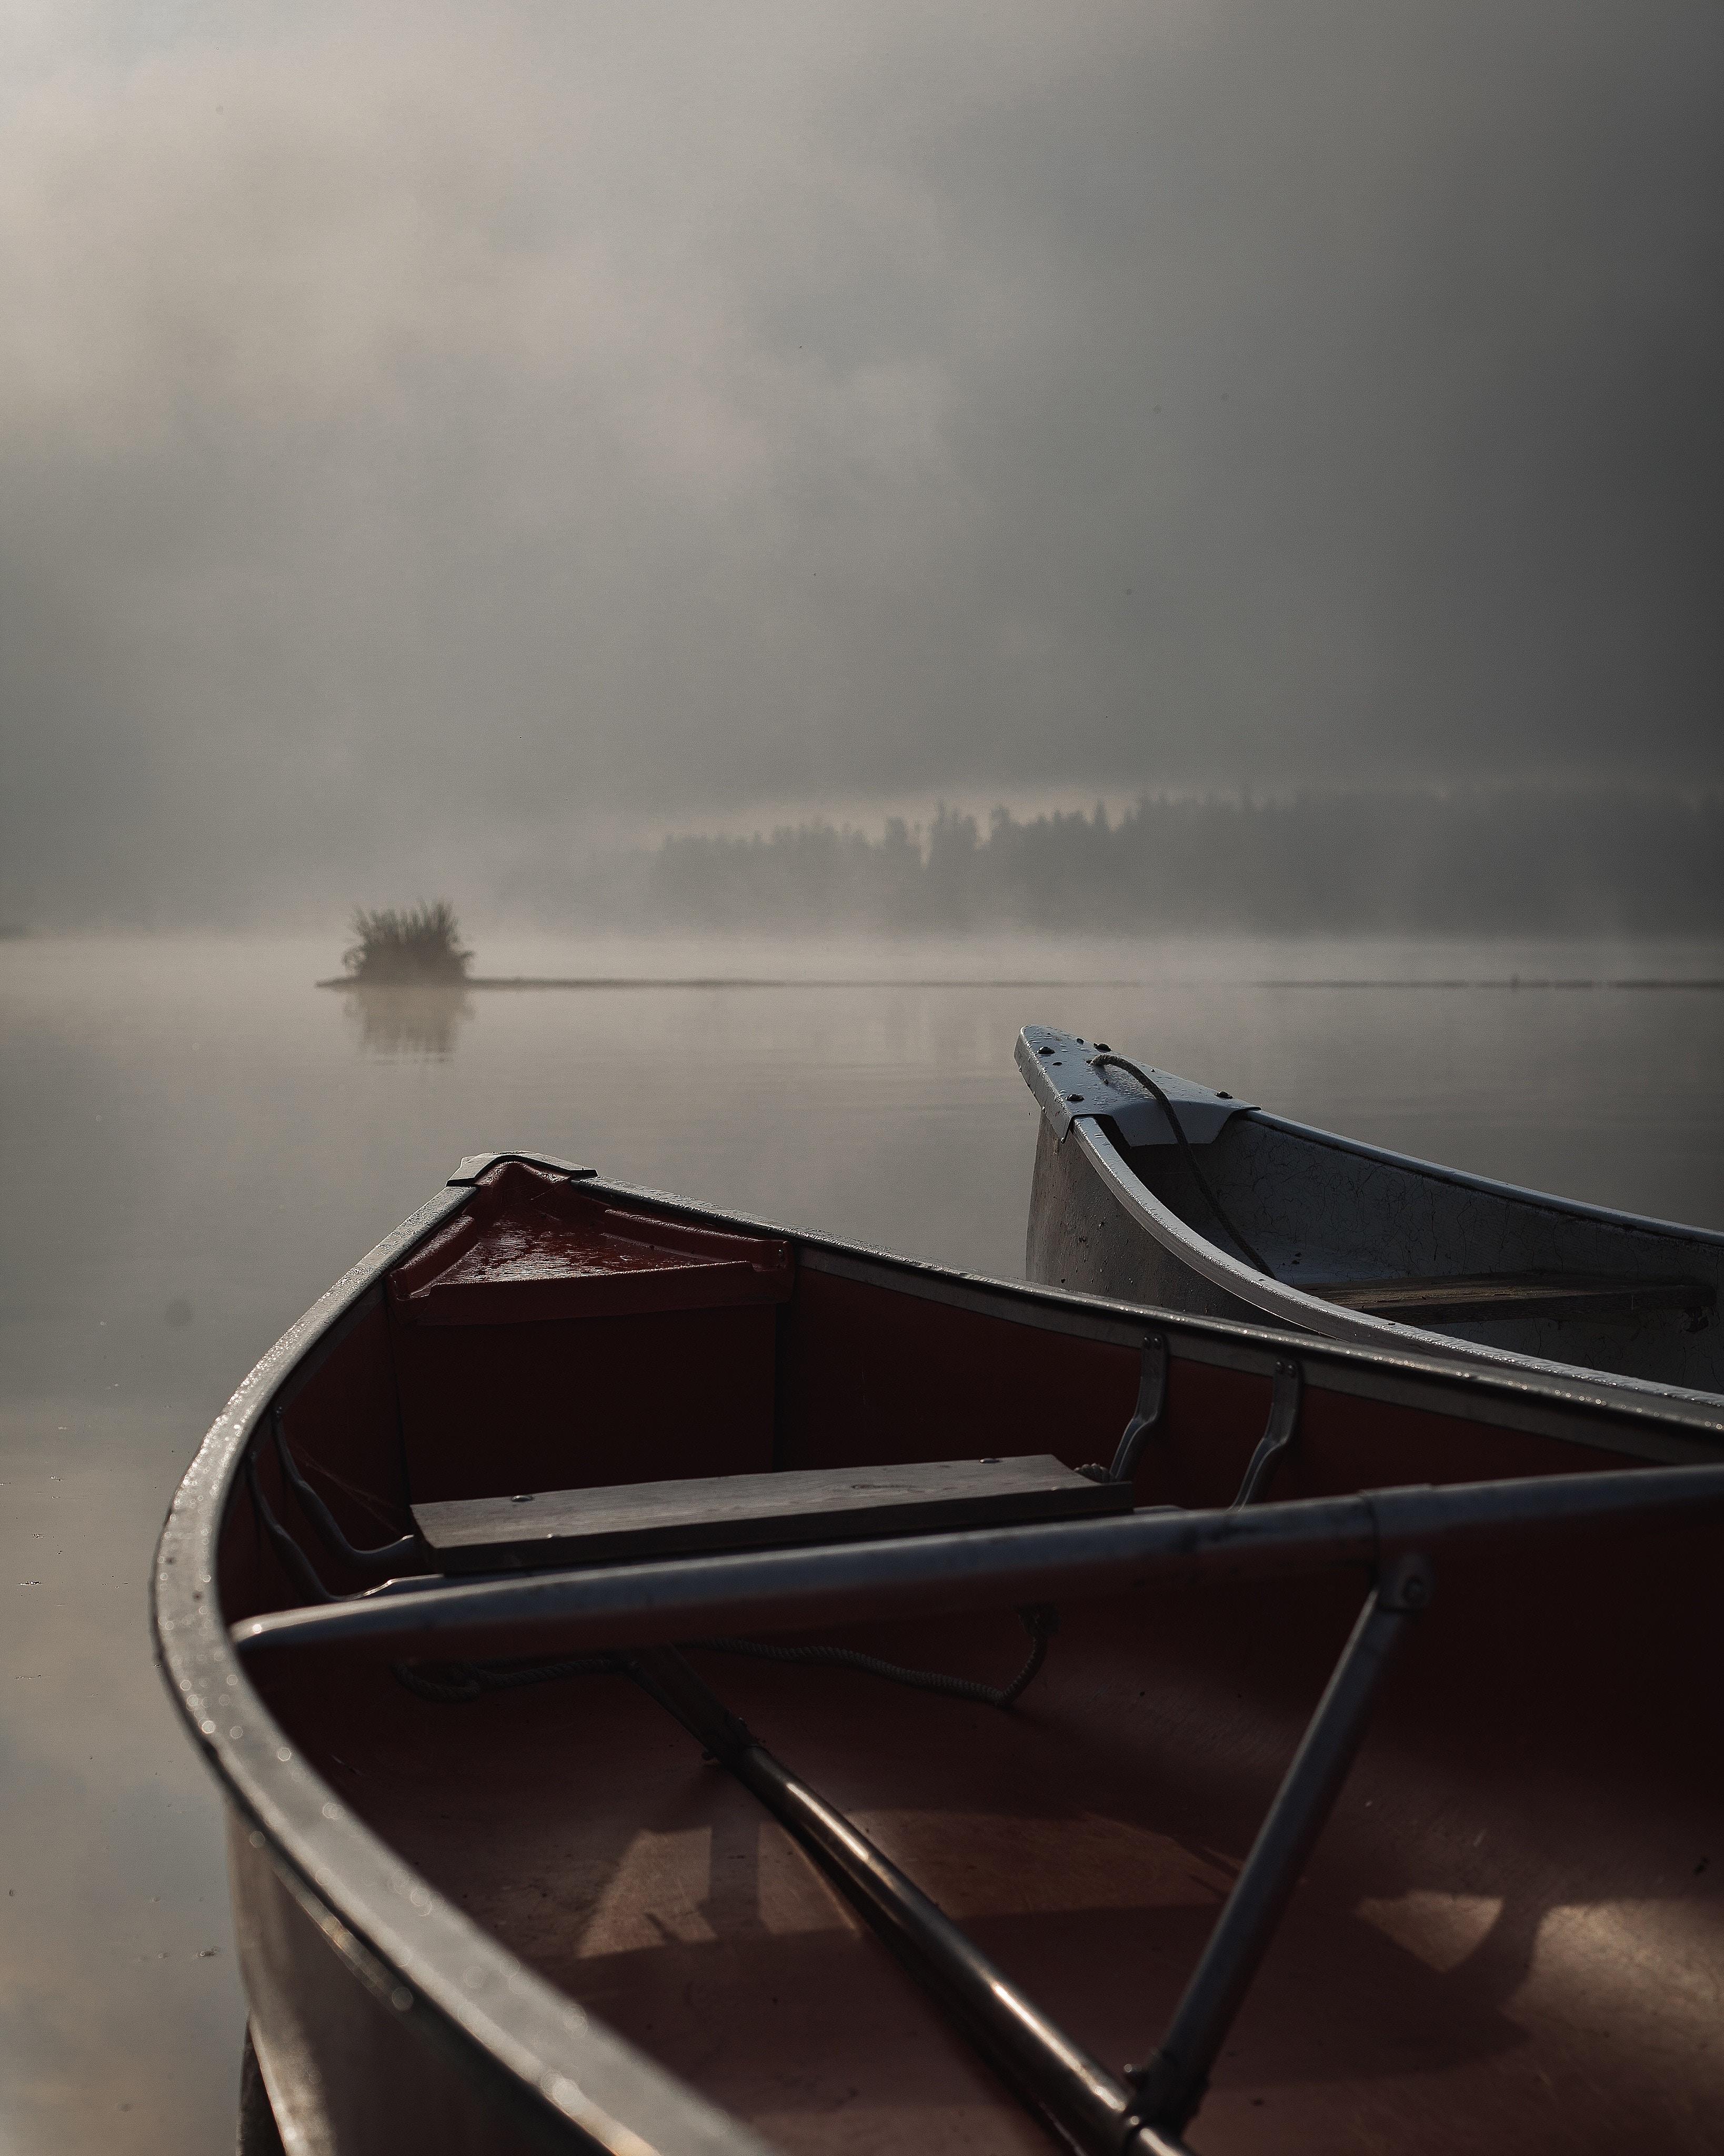 129629 Заставки и Обои Лодки на телефон. Скачать Природа, Лодки, Туман, Река, Вечер картинки бесплатно